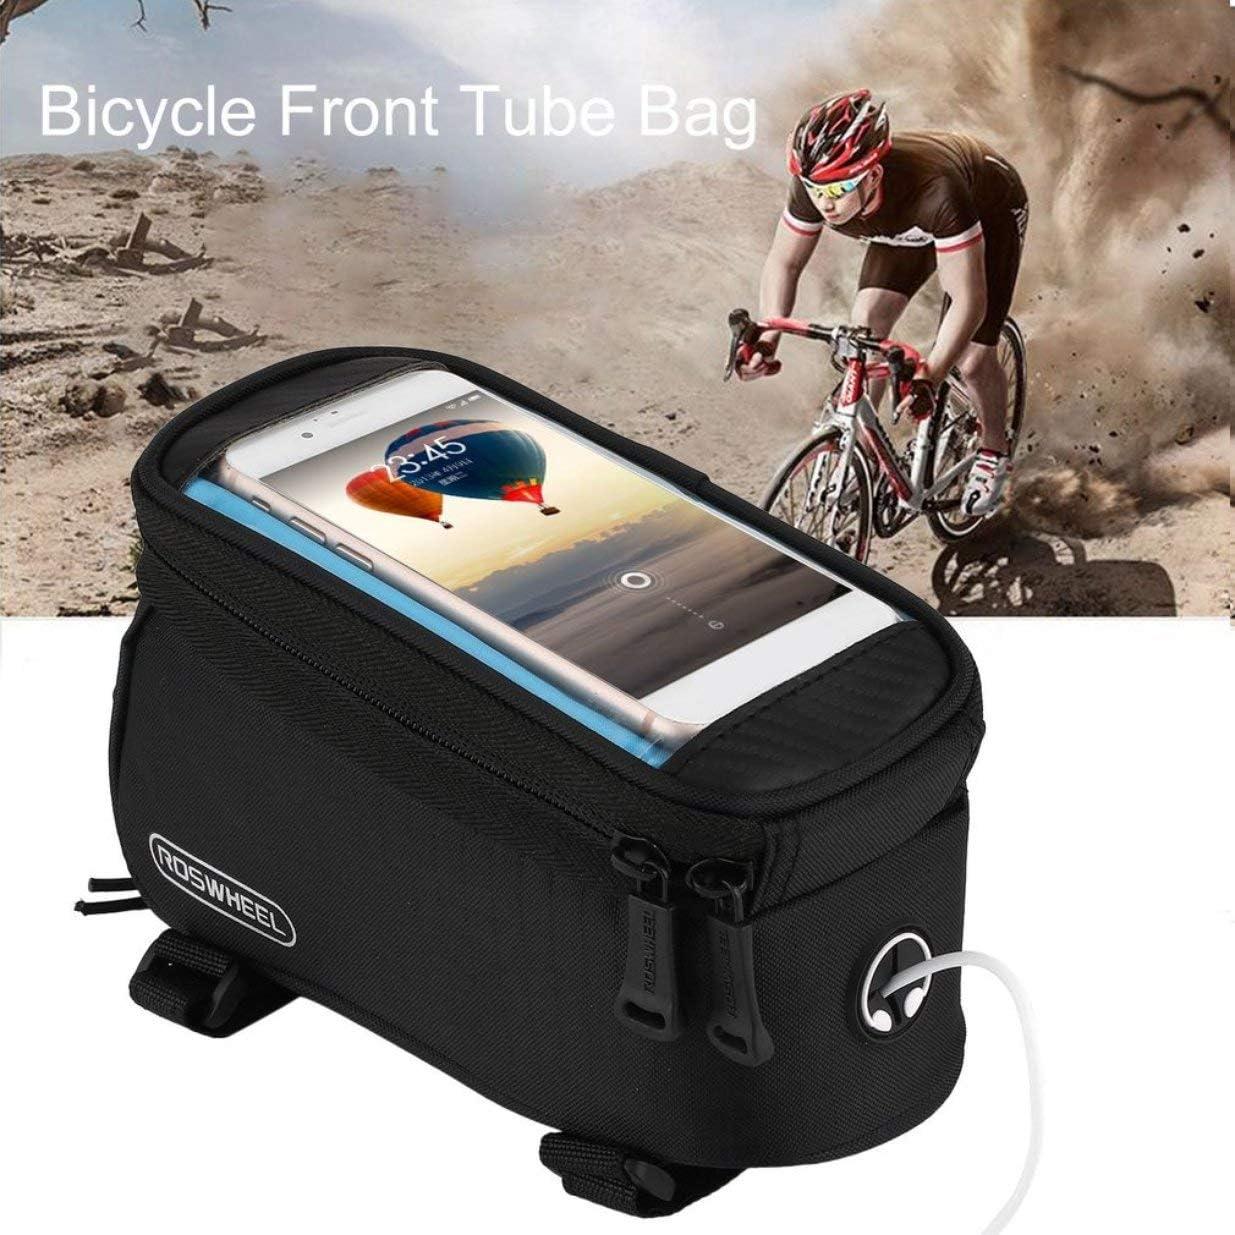 Sairis ROSWHEEL V/élo V/élo V/élo Sacs Sacoches Cadre Avant Tube Tube Sac /À /Écran Tactile Sac pour T/él/éphone Mobile Mountain Bike-Black